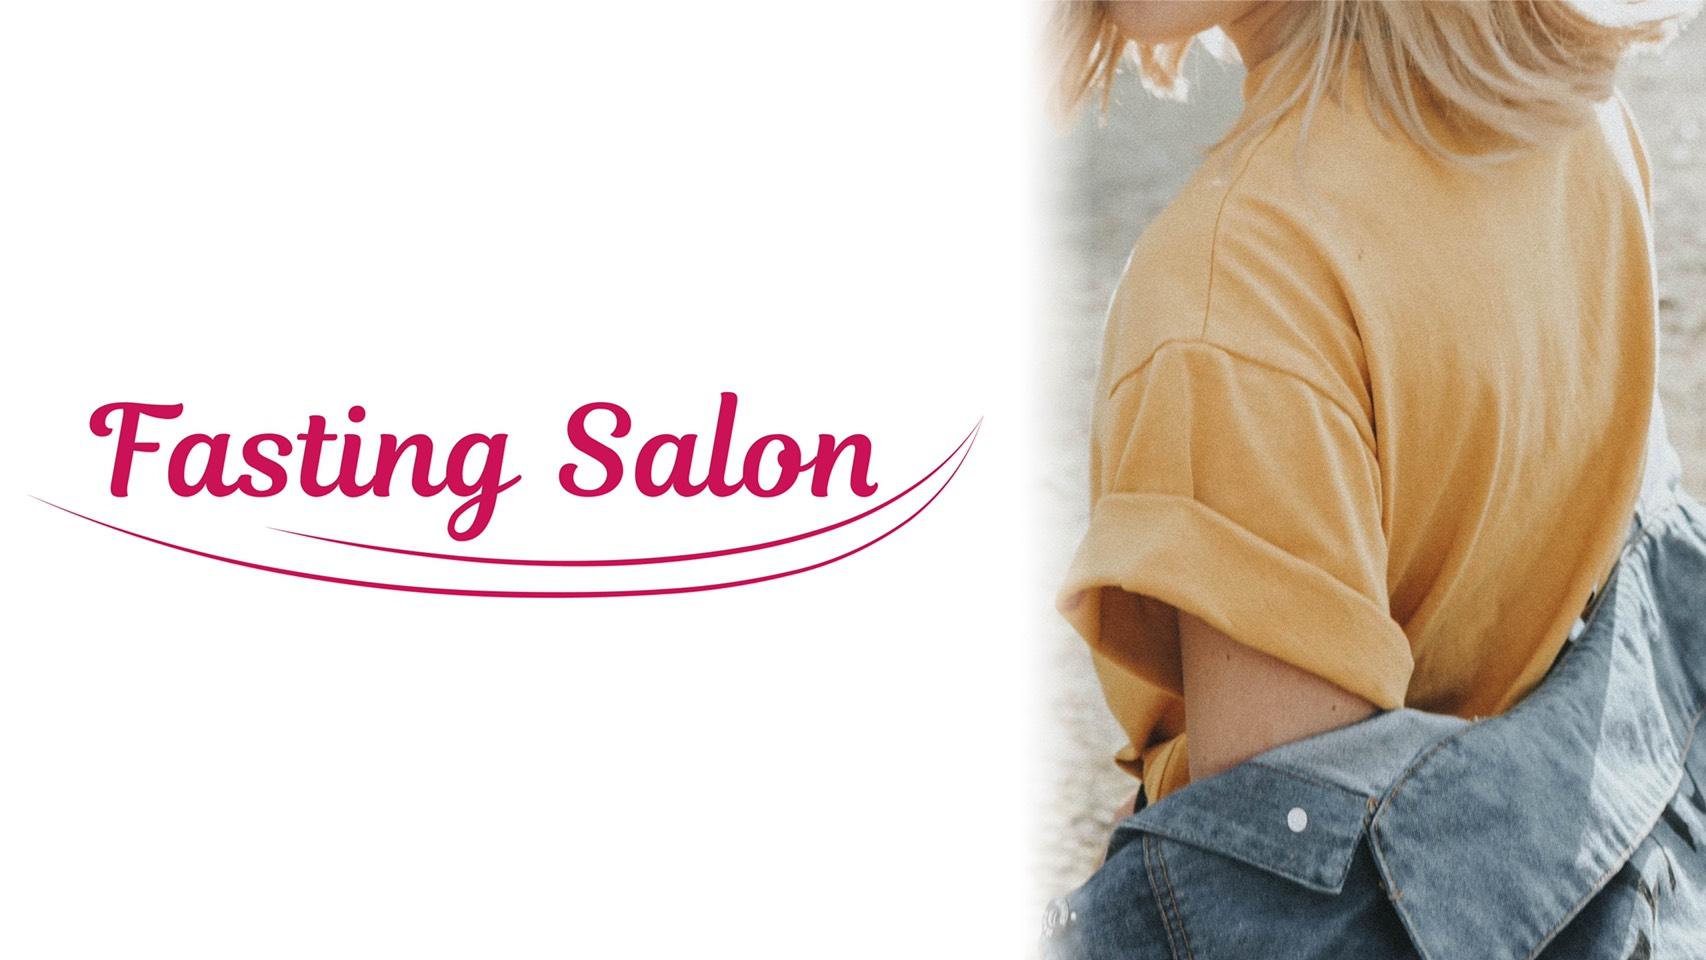 Fasting Salon